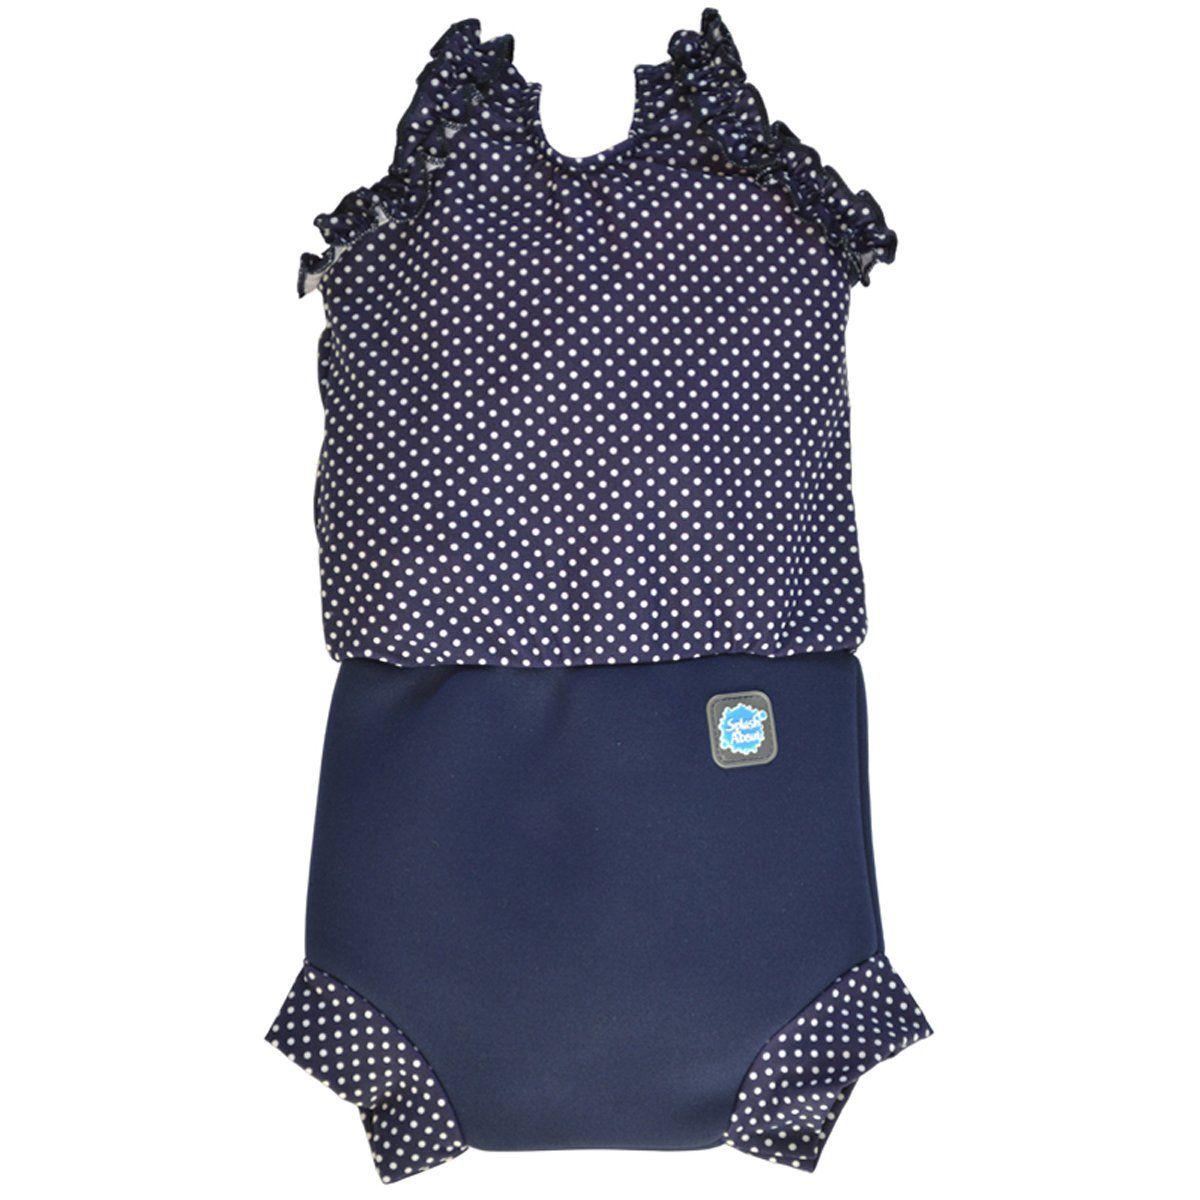 cb1f8bc64 Splash About Kids Happy Nappy Swimming Costume  Amazon.co.uk ...